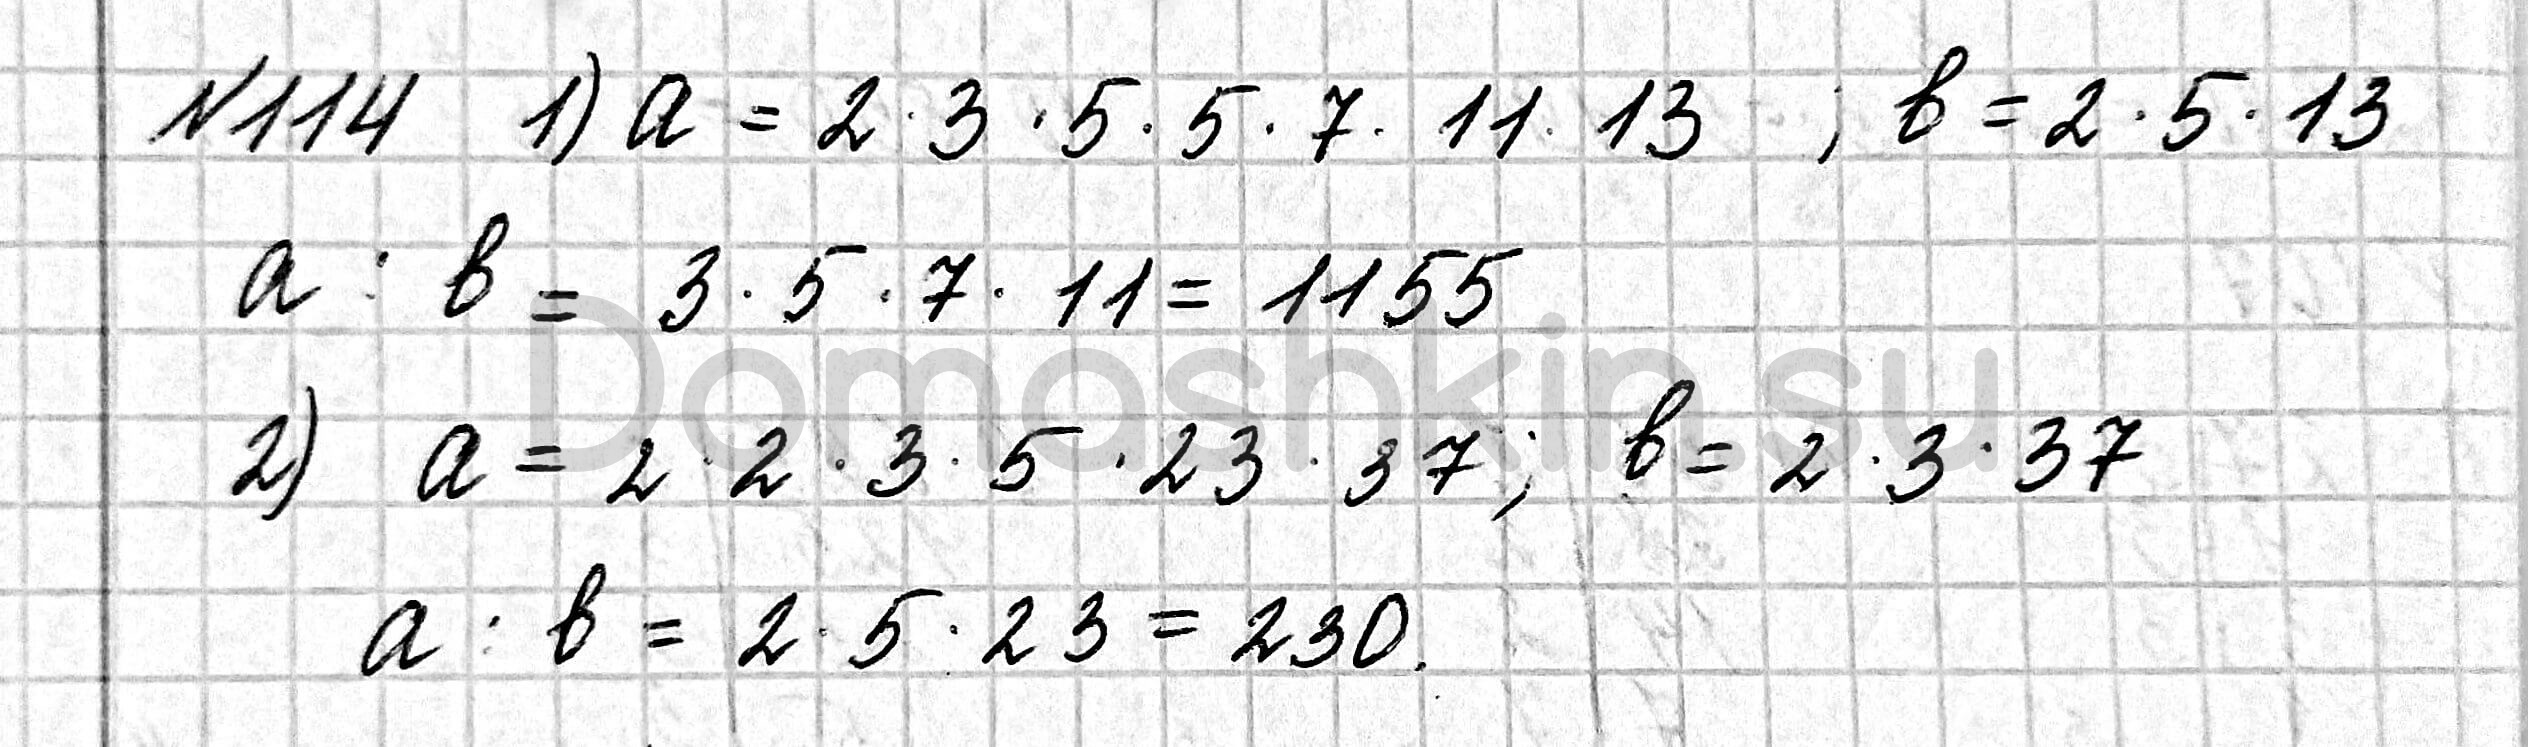 Математика 6 класс учебник Мерзляк номер 114 решение